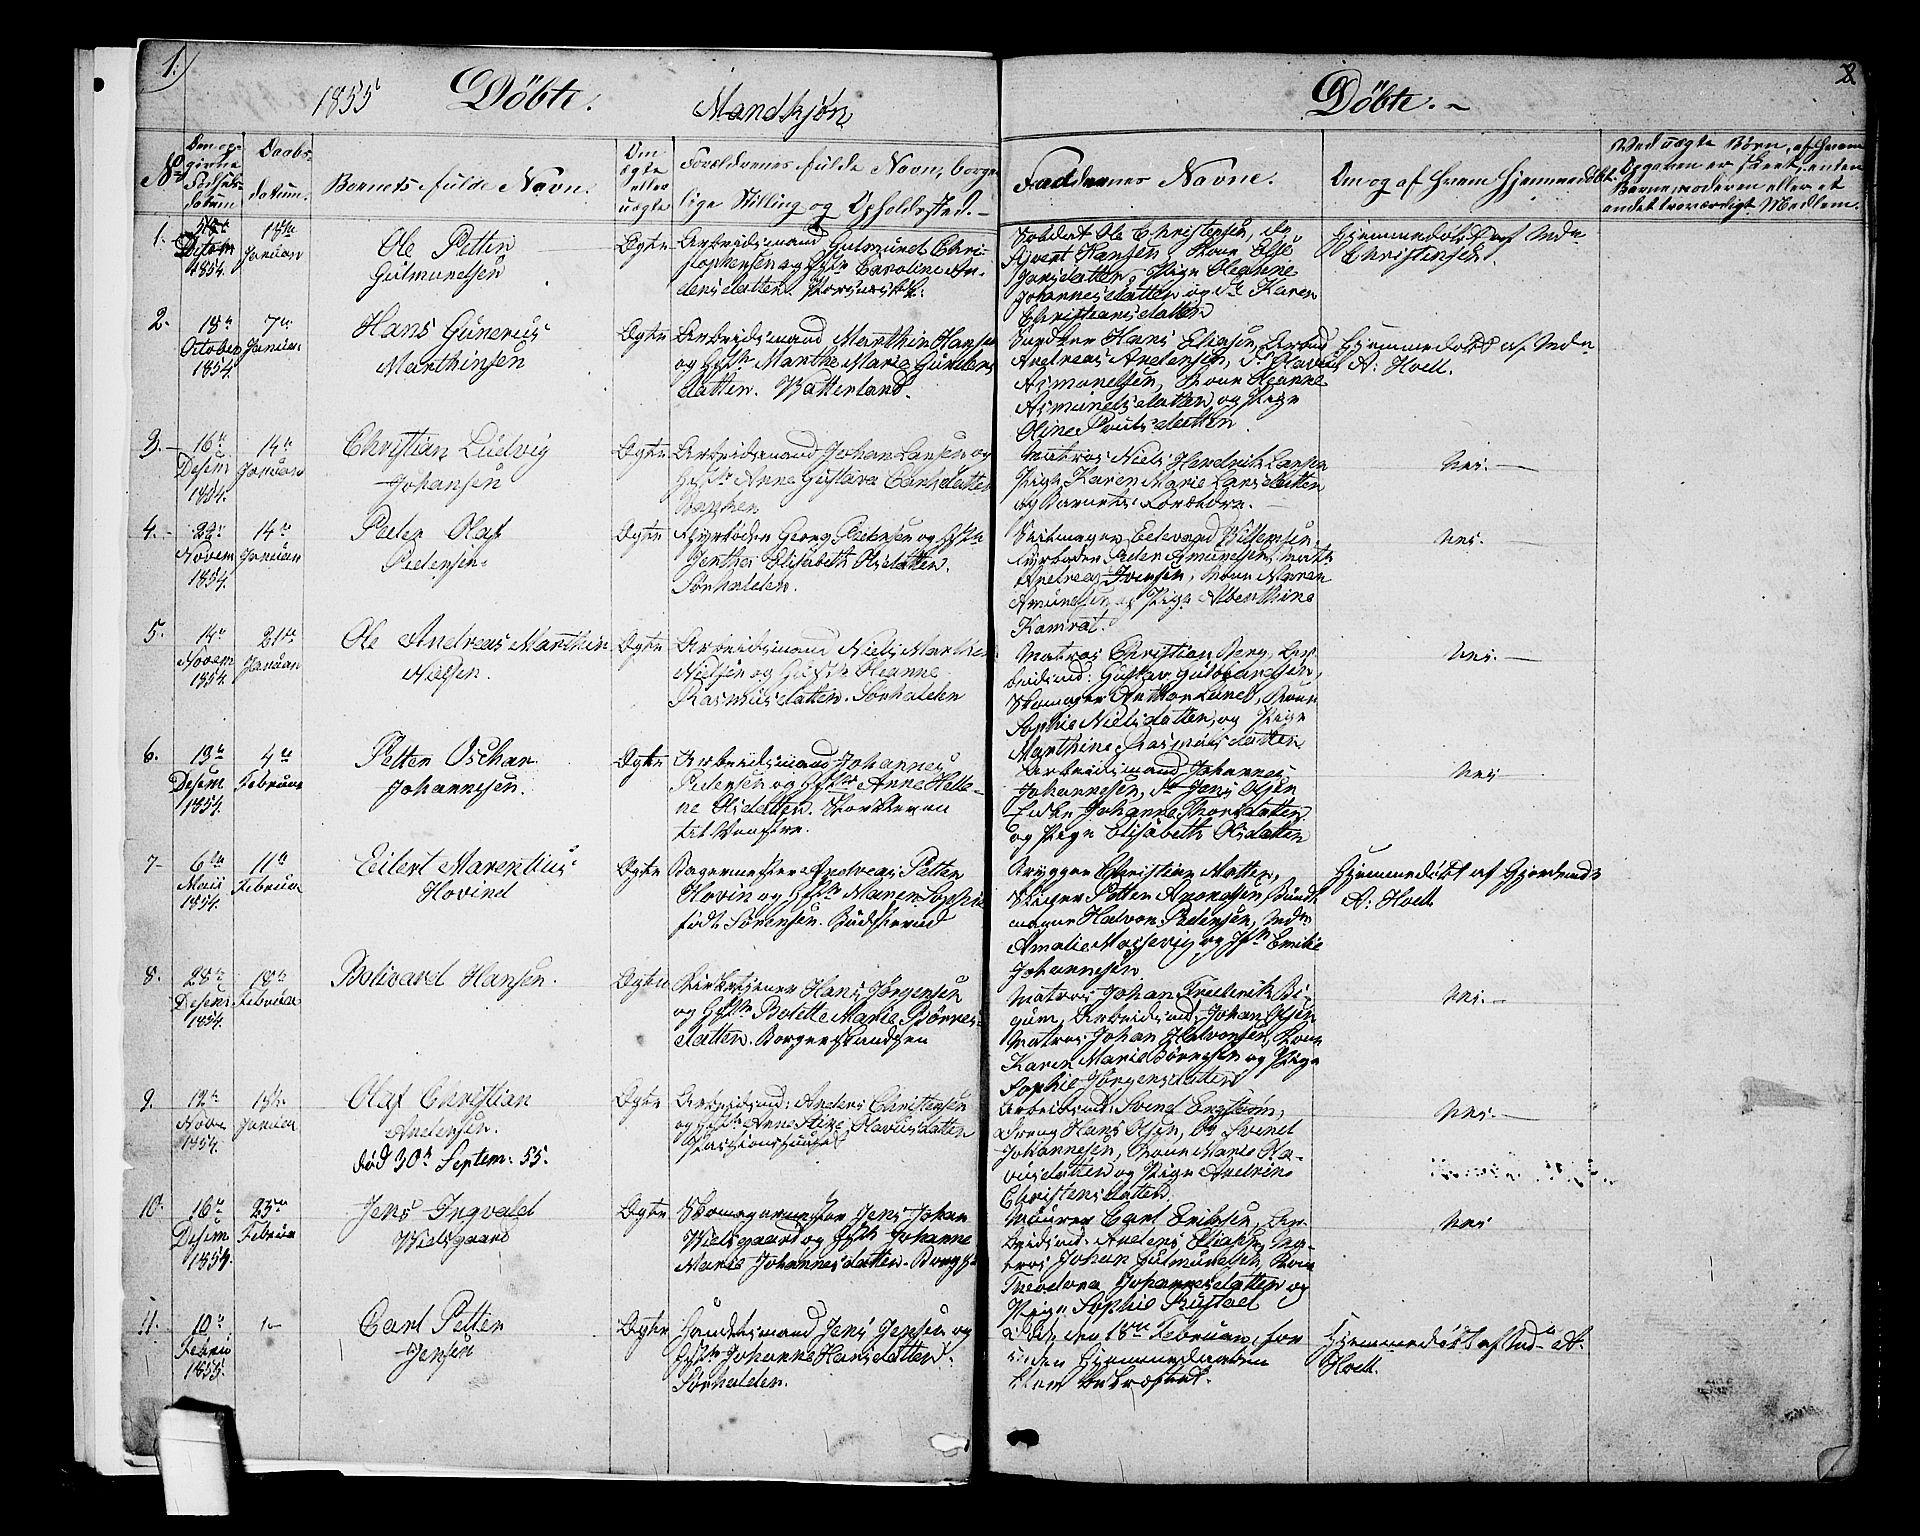 SAO, Halden prestekontor Kirkebøker, G/Ga/L0005a: Klokkerbok nr. 5A, 1855-1864, s. 1